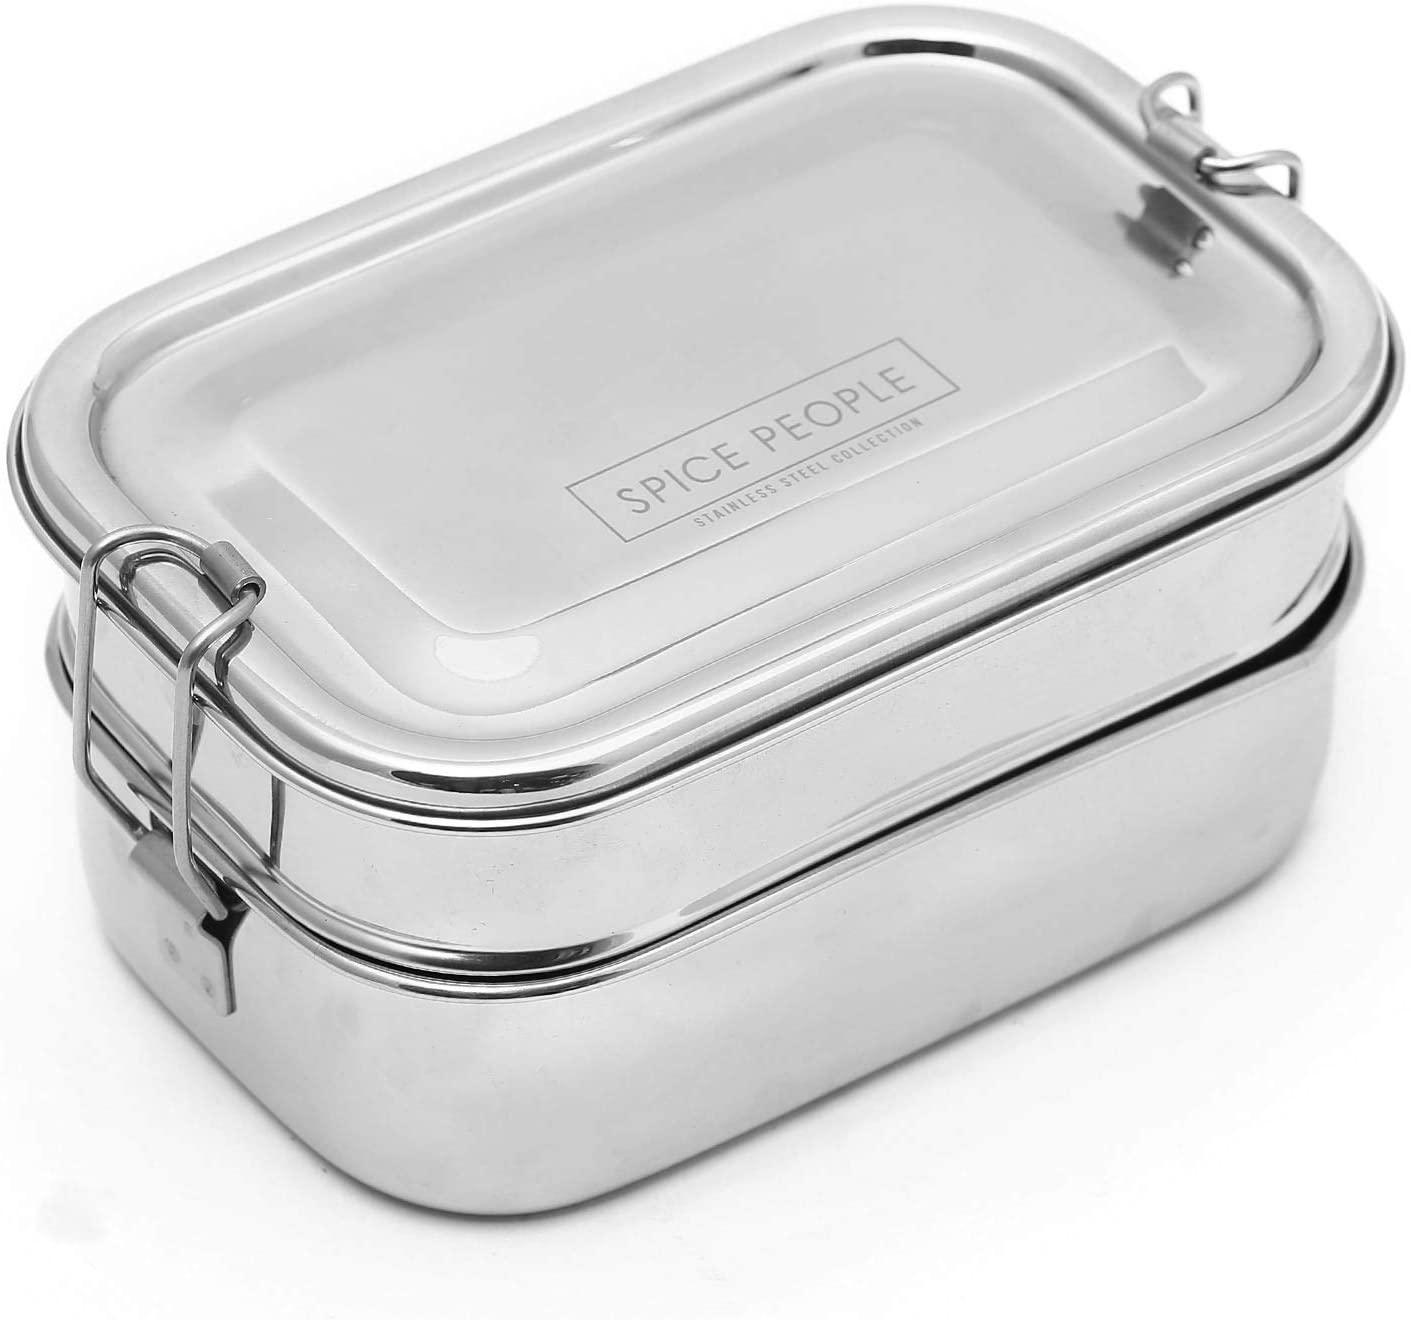 Stainless Steel Tiffin Box - Steel Tiffin Lunch Box Kids - Bento Box Lunch Box - Rectangular Bento Box Stainless - Tiffin Box for Toddlers - Rectangle Tiffin Box - Two Tier Tiffin Box (18x12x7 cm)